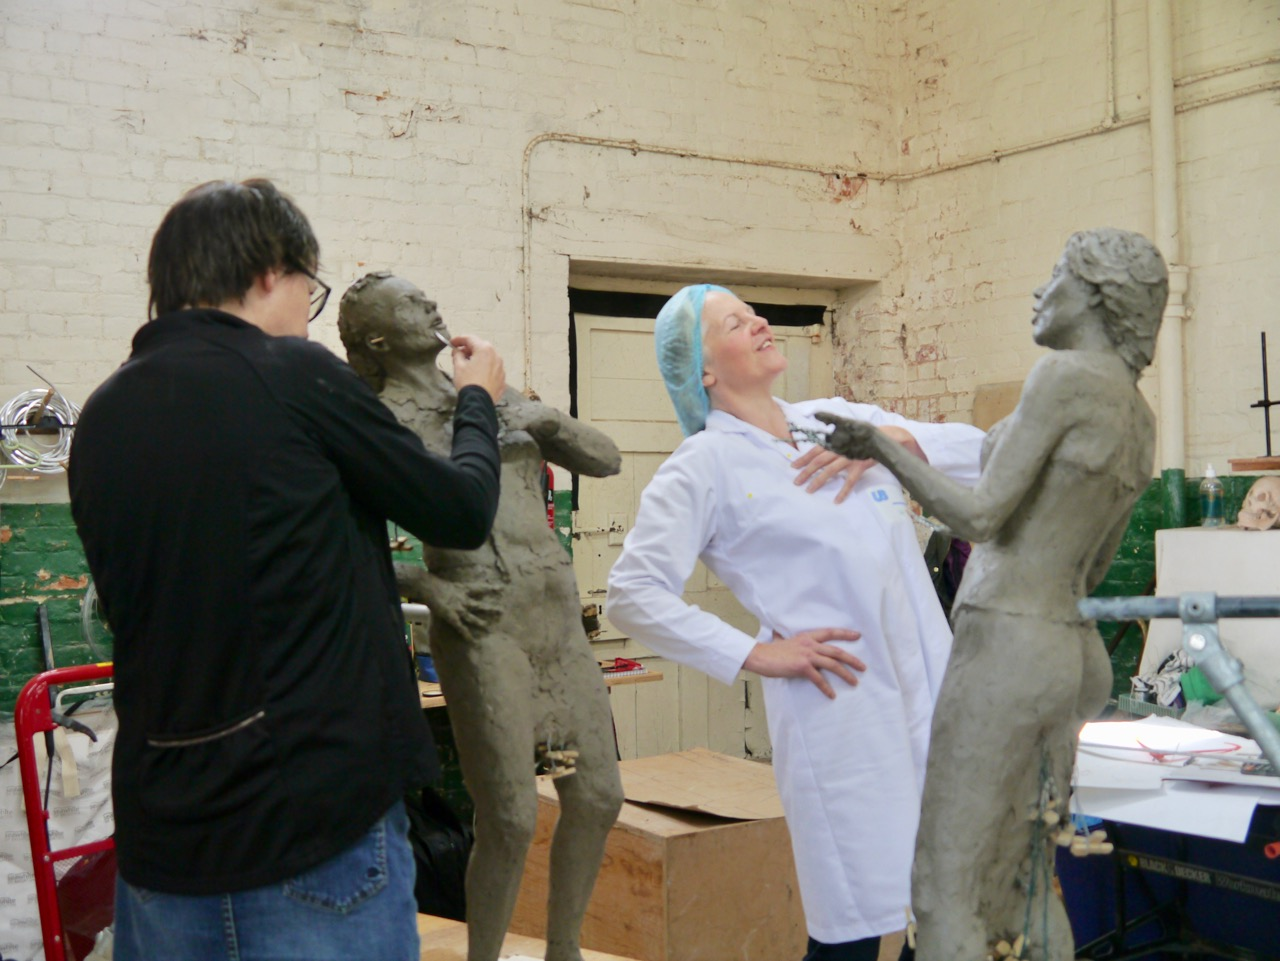 Sculpting the clothed figure – I